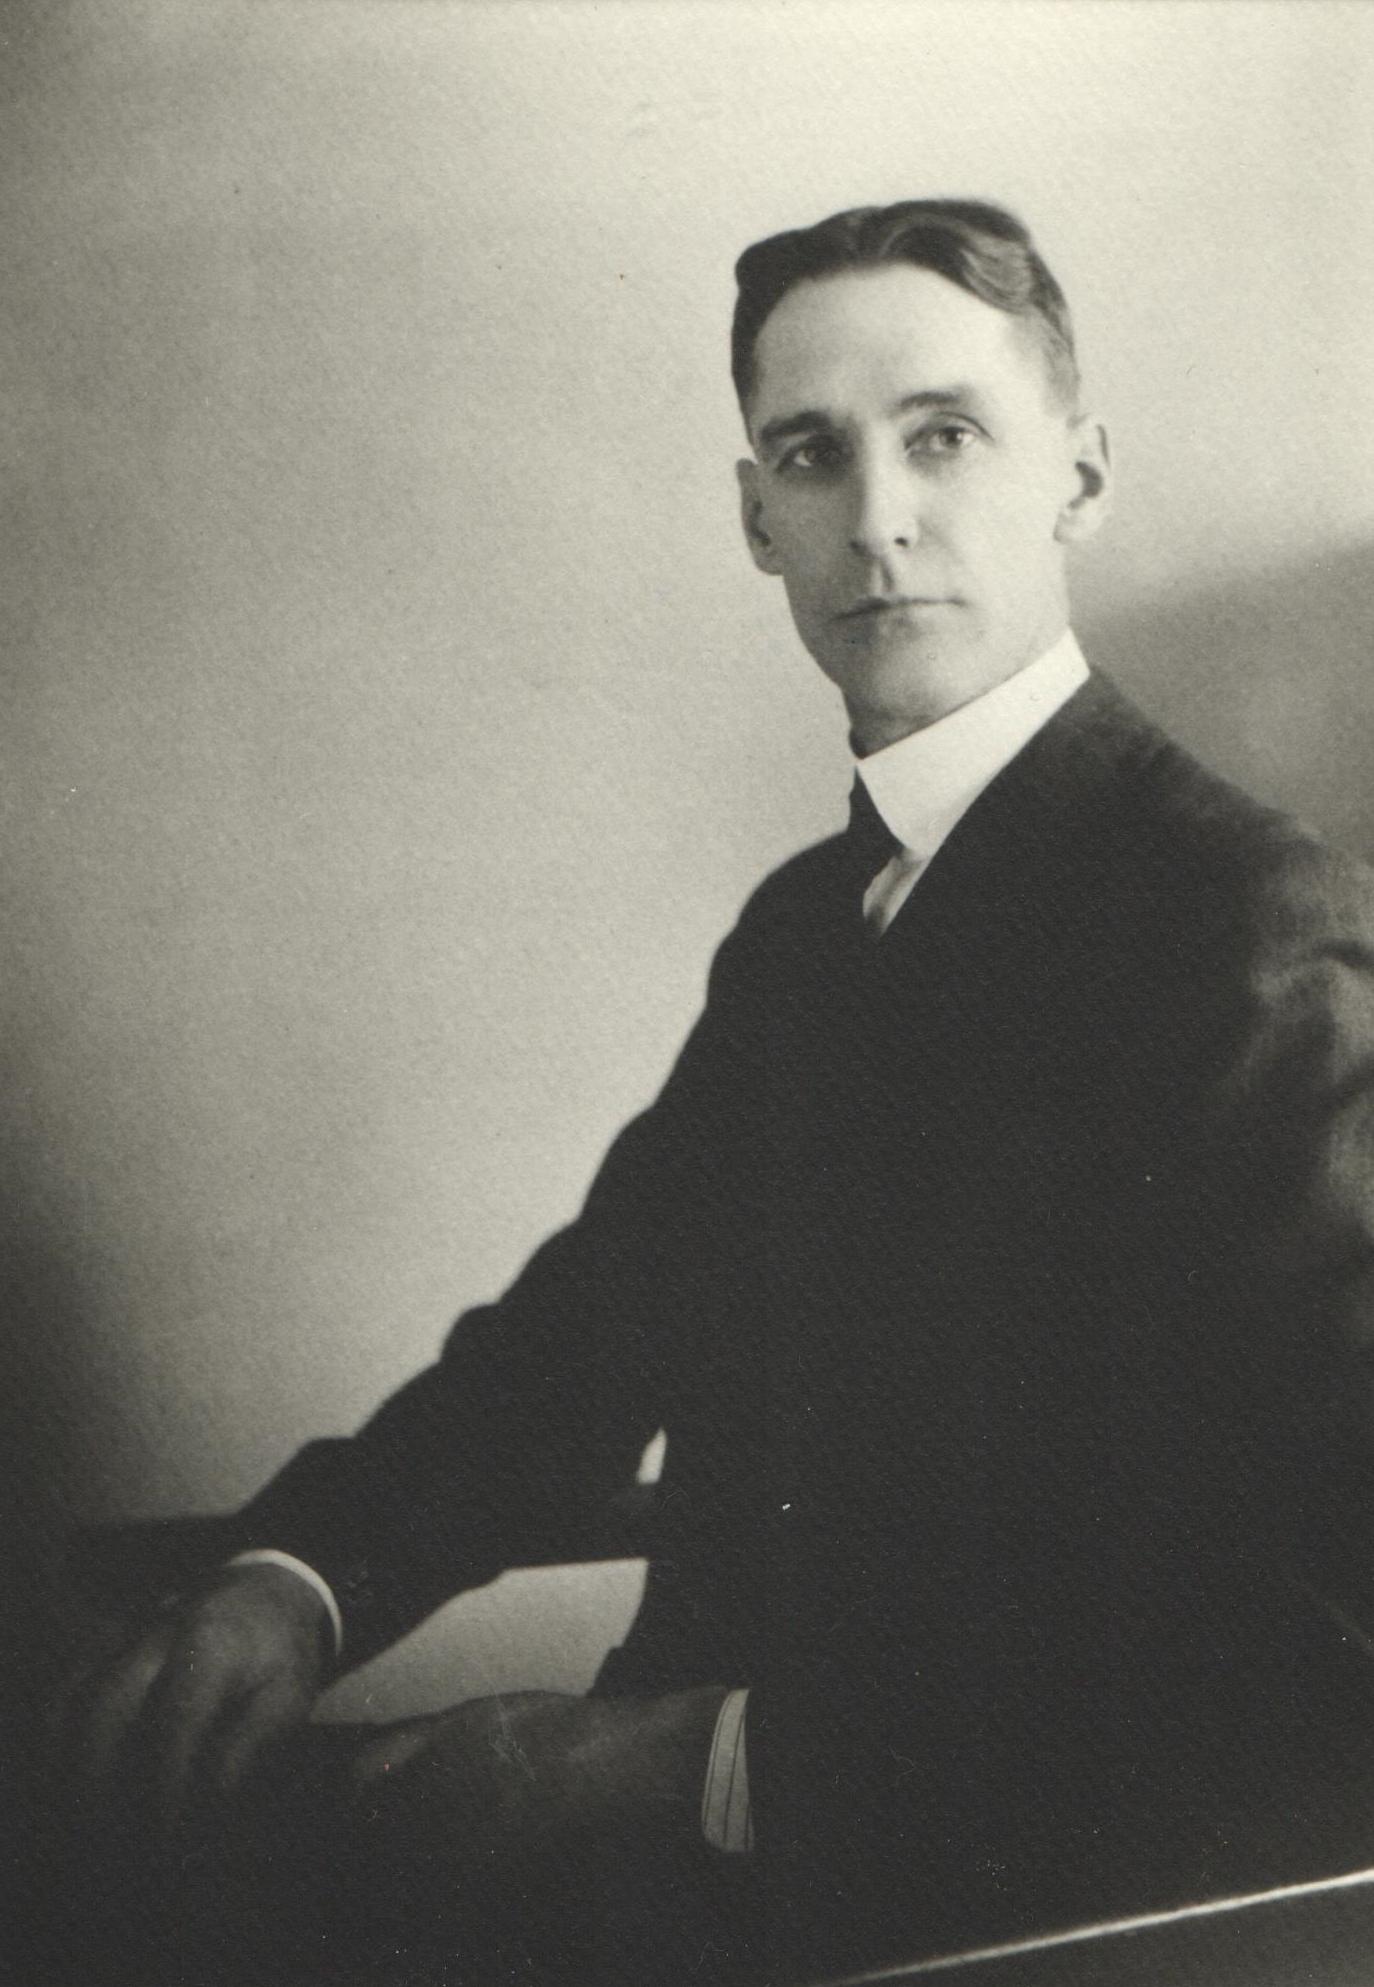 1913 H. E. Loye